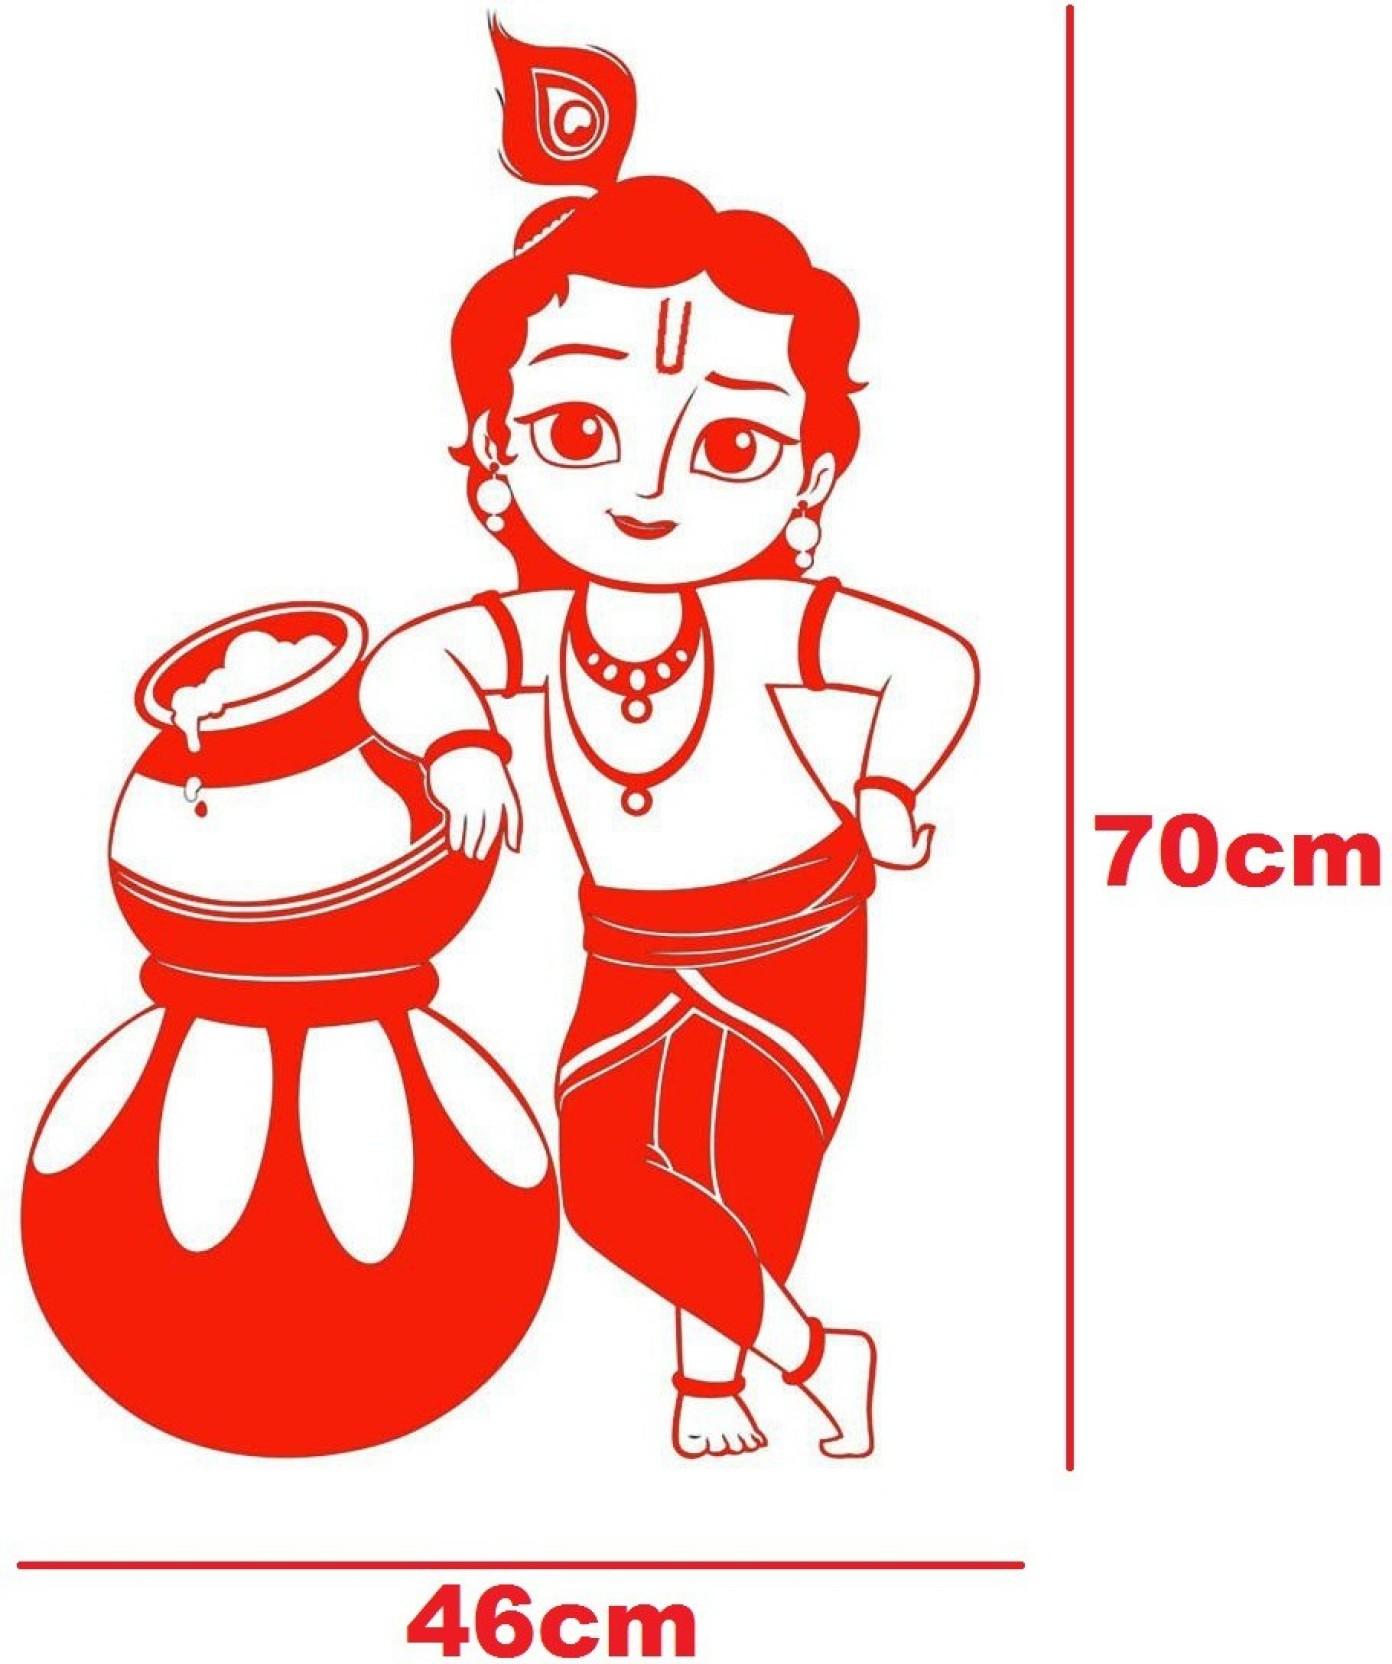 Marvellous large jai shree krishna wall decal god krishna sticker pack of 1